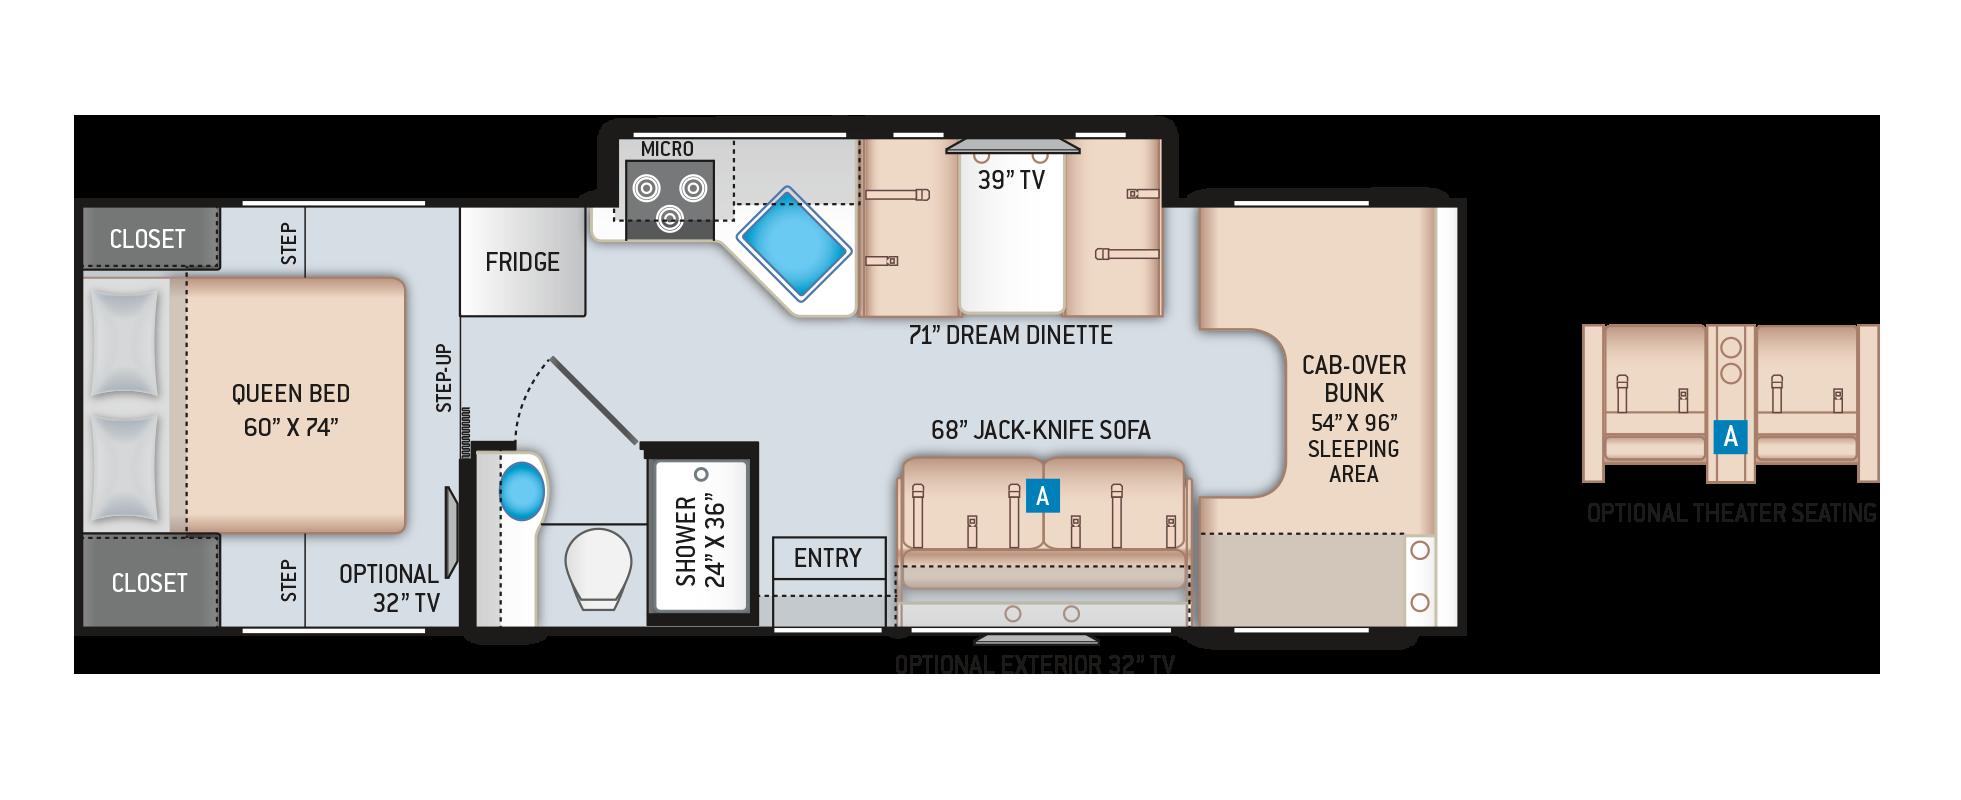 Chateau Class C Motorhome 28Z Floor Plan